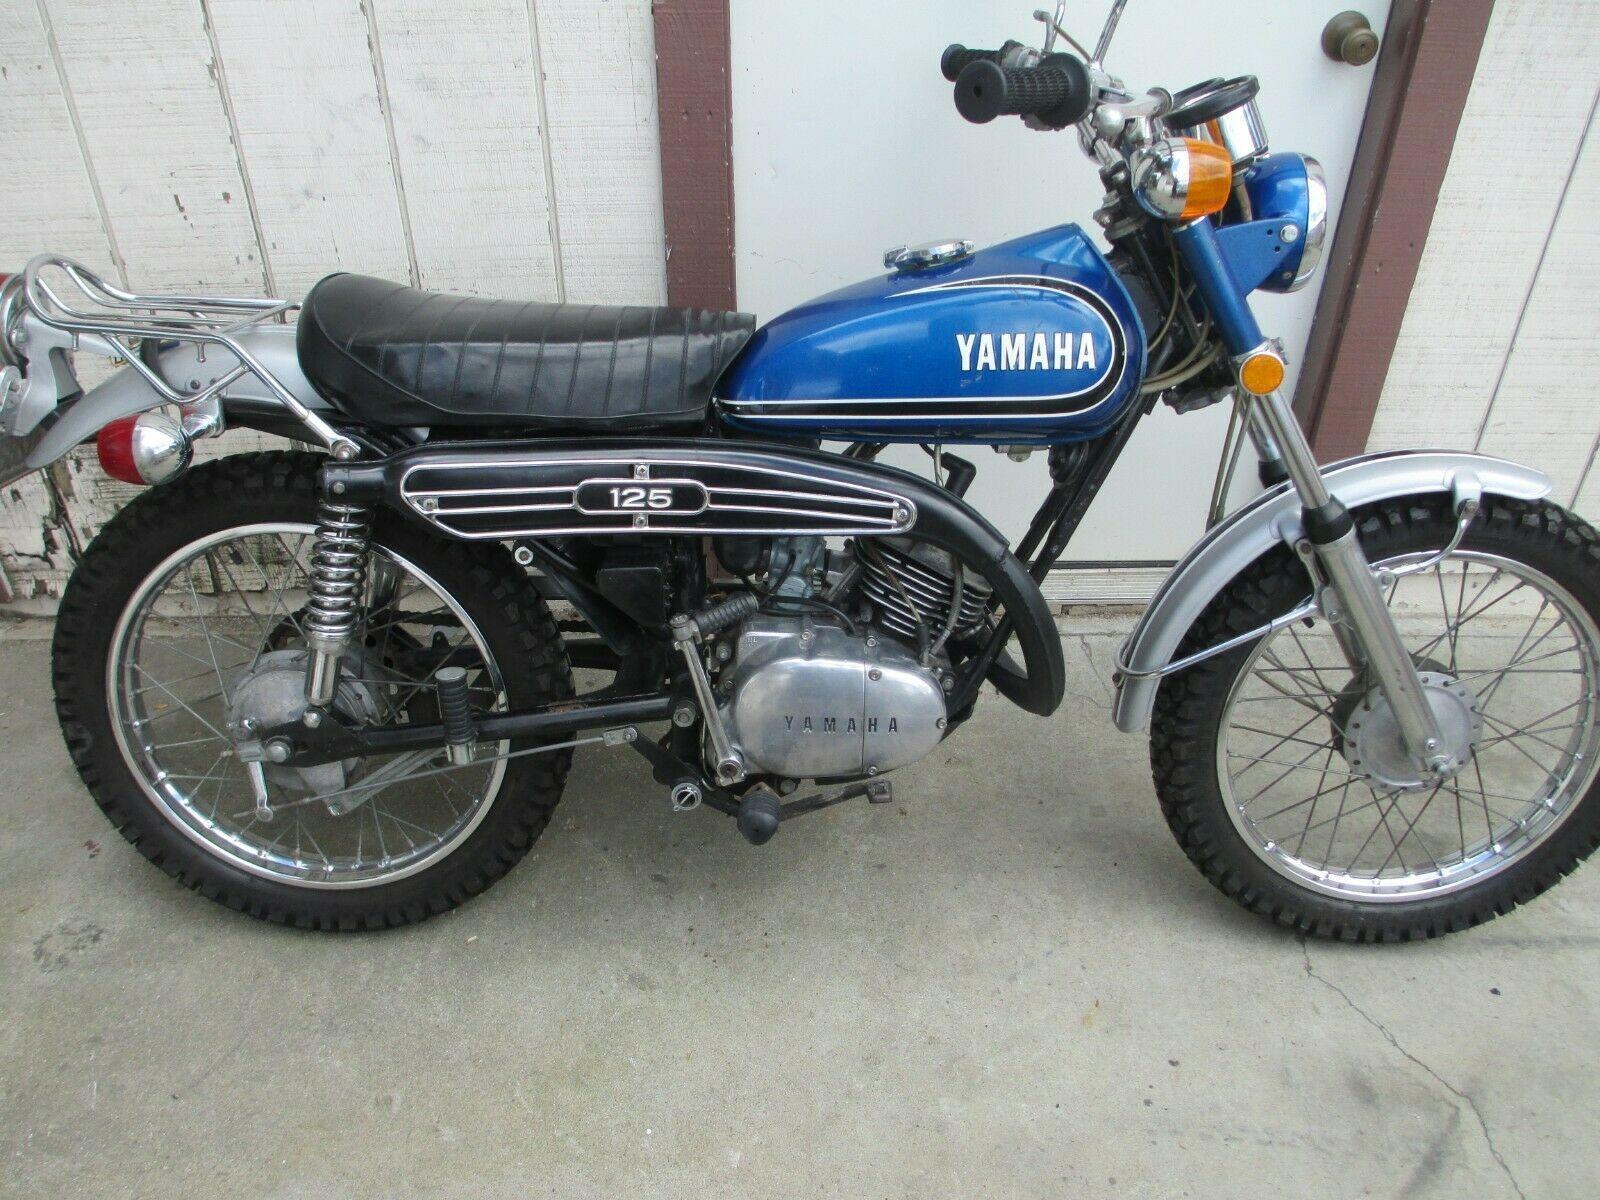 1973 Yamaha At1 125 Enduro Yamaha Vintage Bikes Motorcycles For Sale